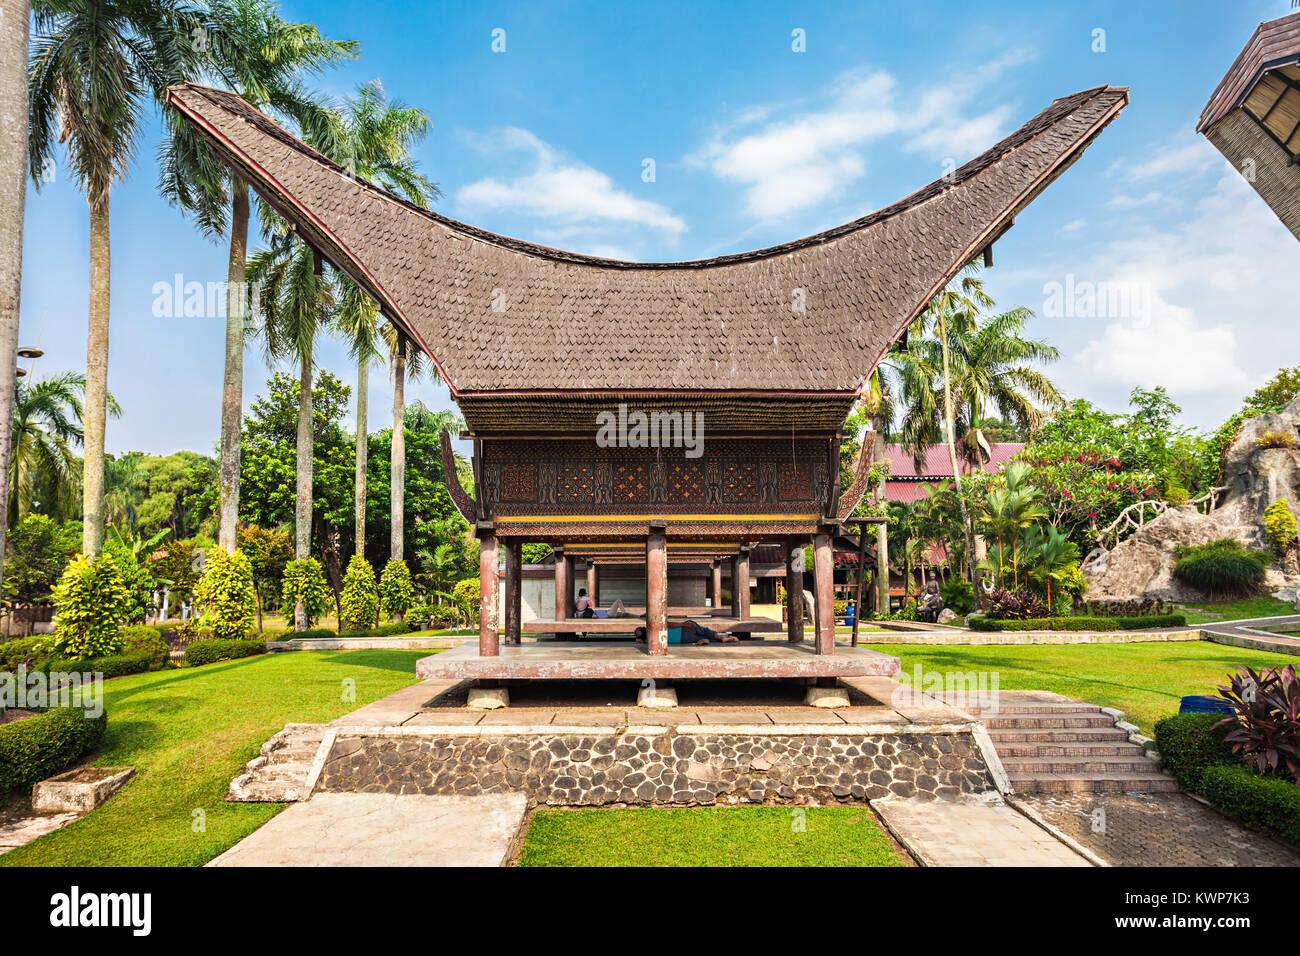 Sulawesi pavilion in the Taman Mini Indonesia Park - Stock Image